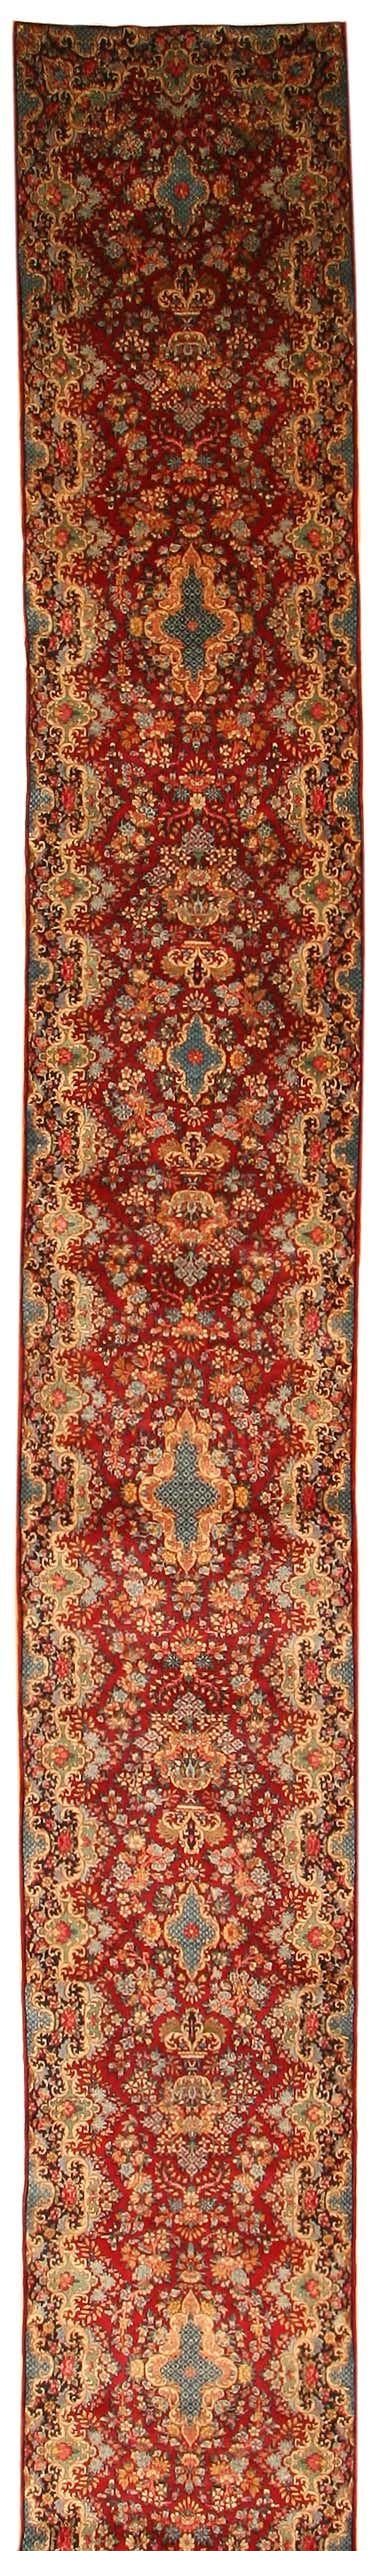 Antique Kerman Persian Rugs 43853 http://nazmiyalantiquerugs.com/antique-rugs/all-over/antique-kerman-persian-rugs-43853/